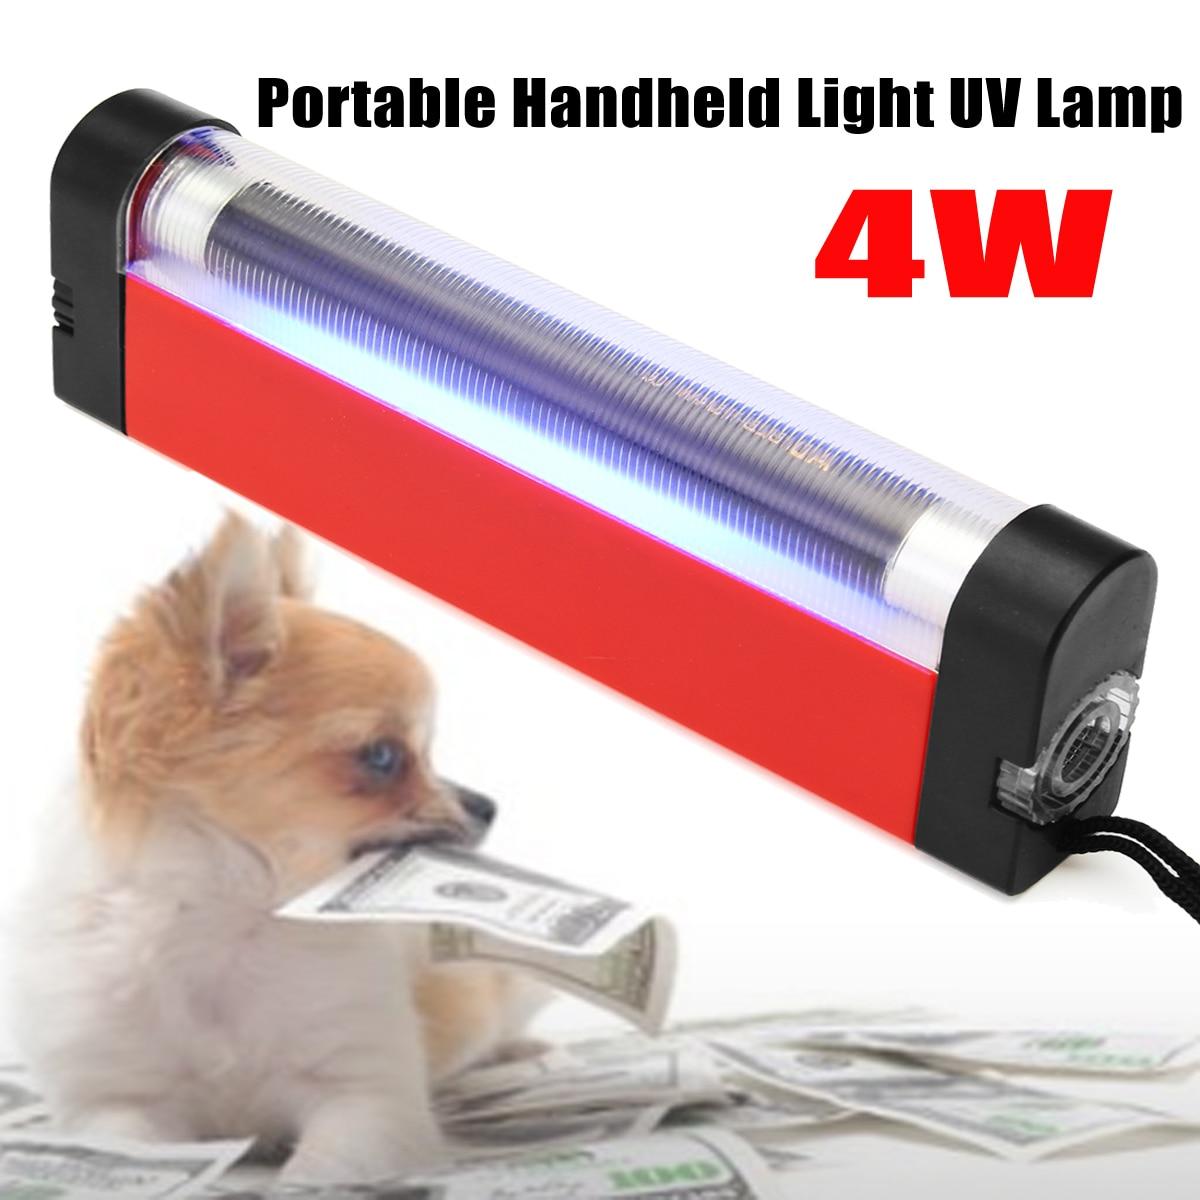 New Portable Handheld Wood's Light UV Lamp 4W for Skin Care Diagnosis Torch Light Flashlight